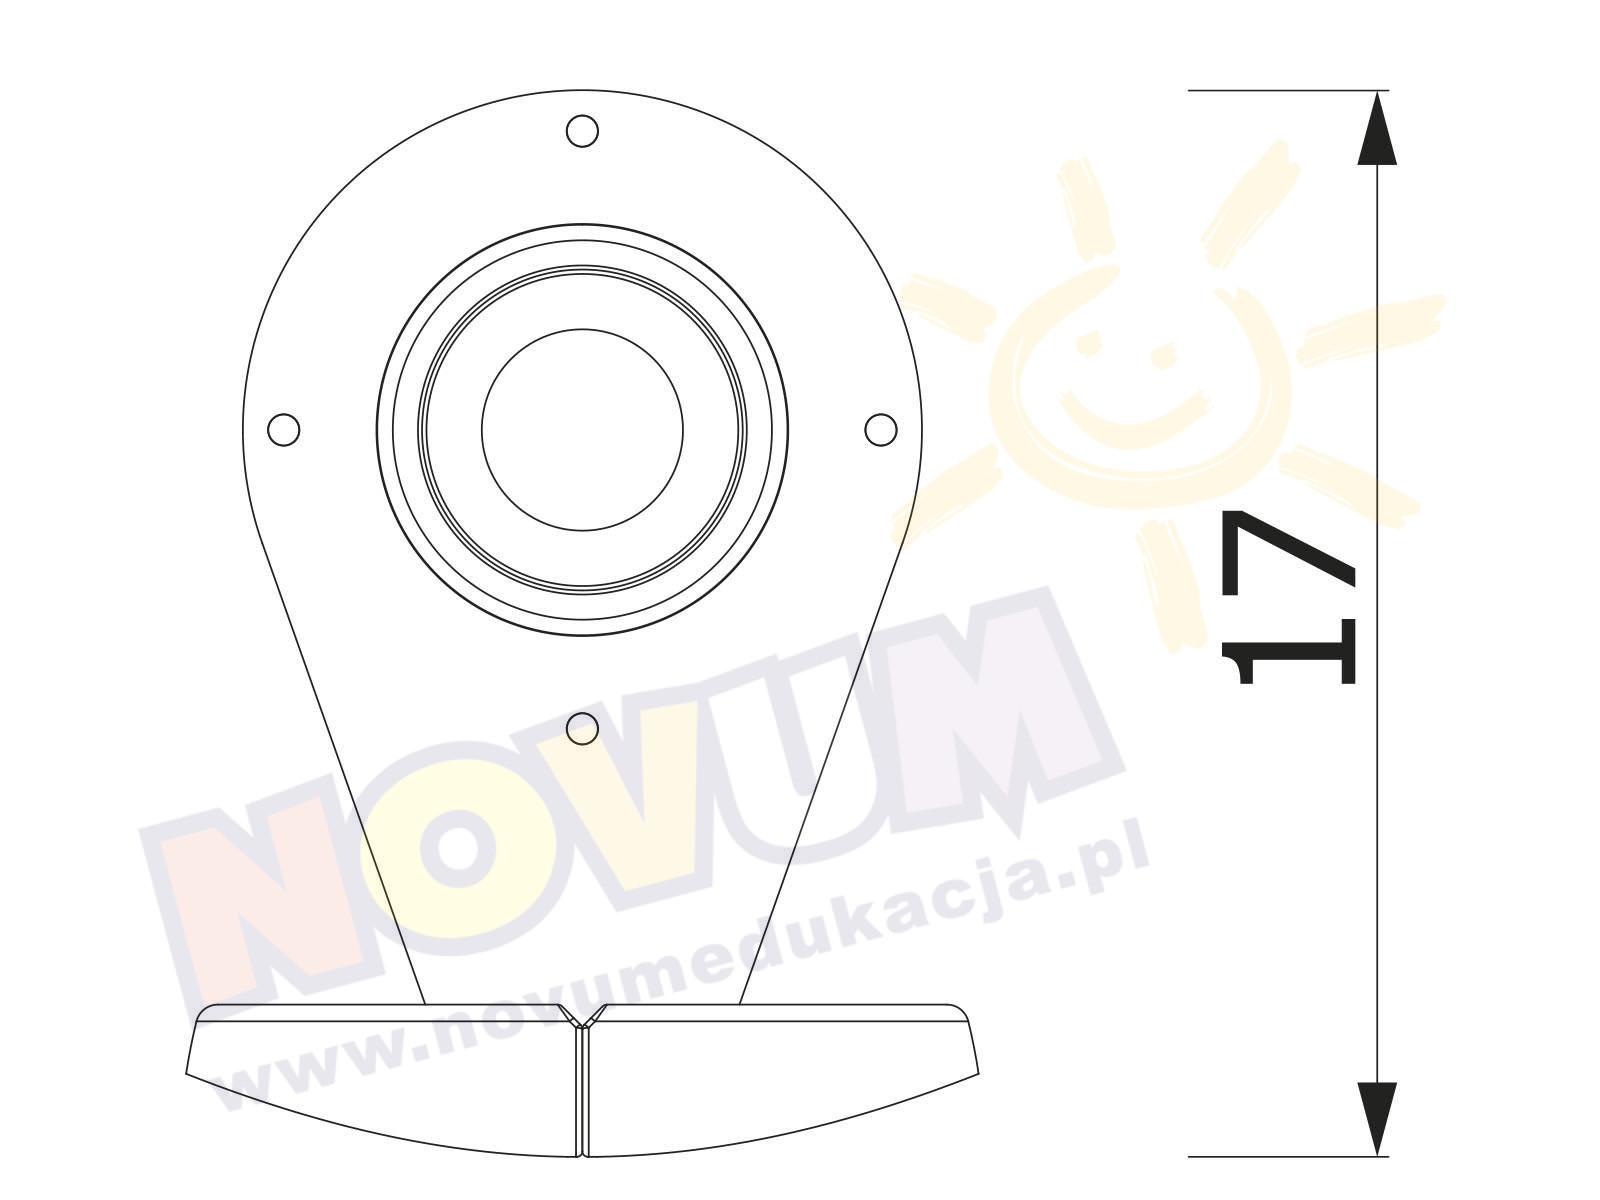 Kalejdoskop